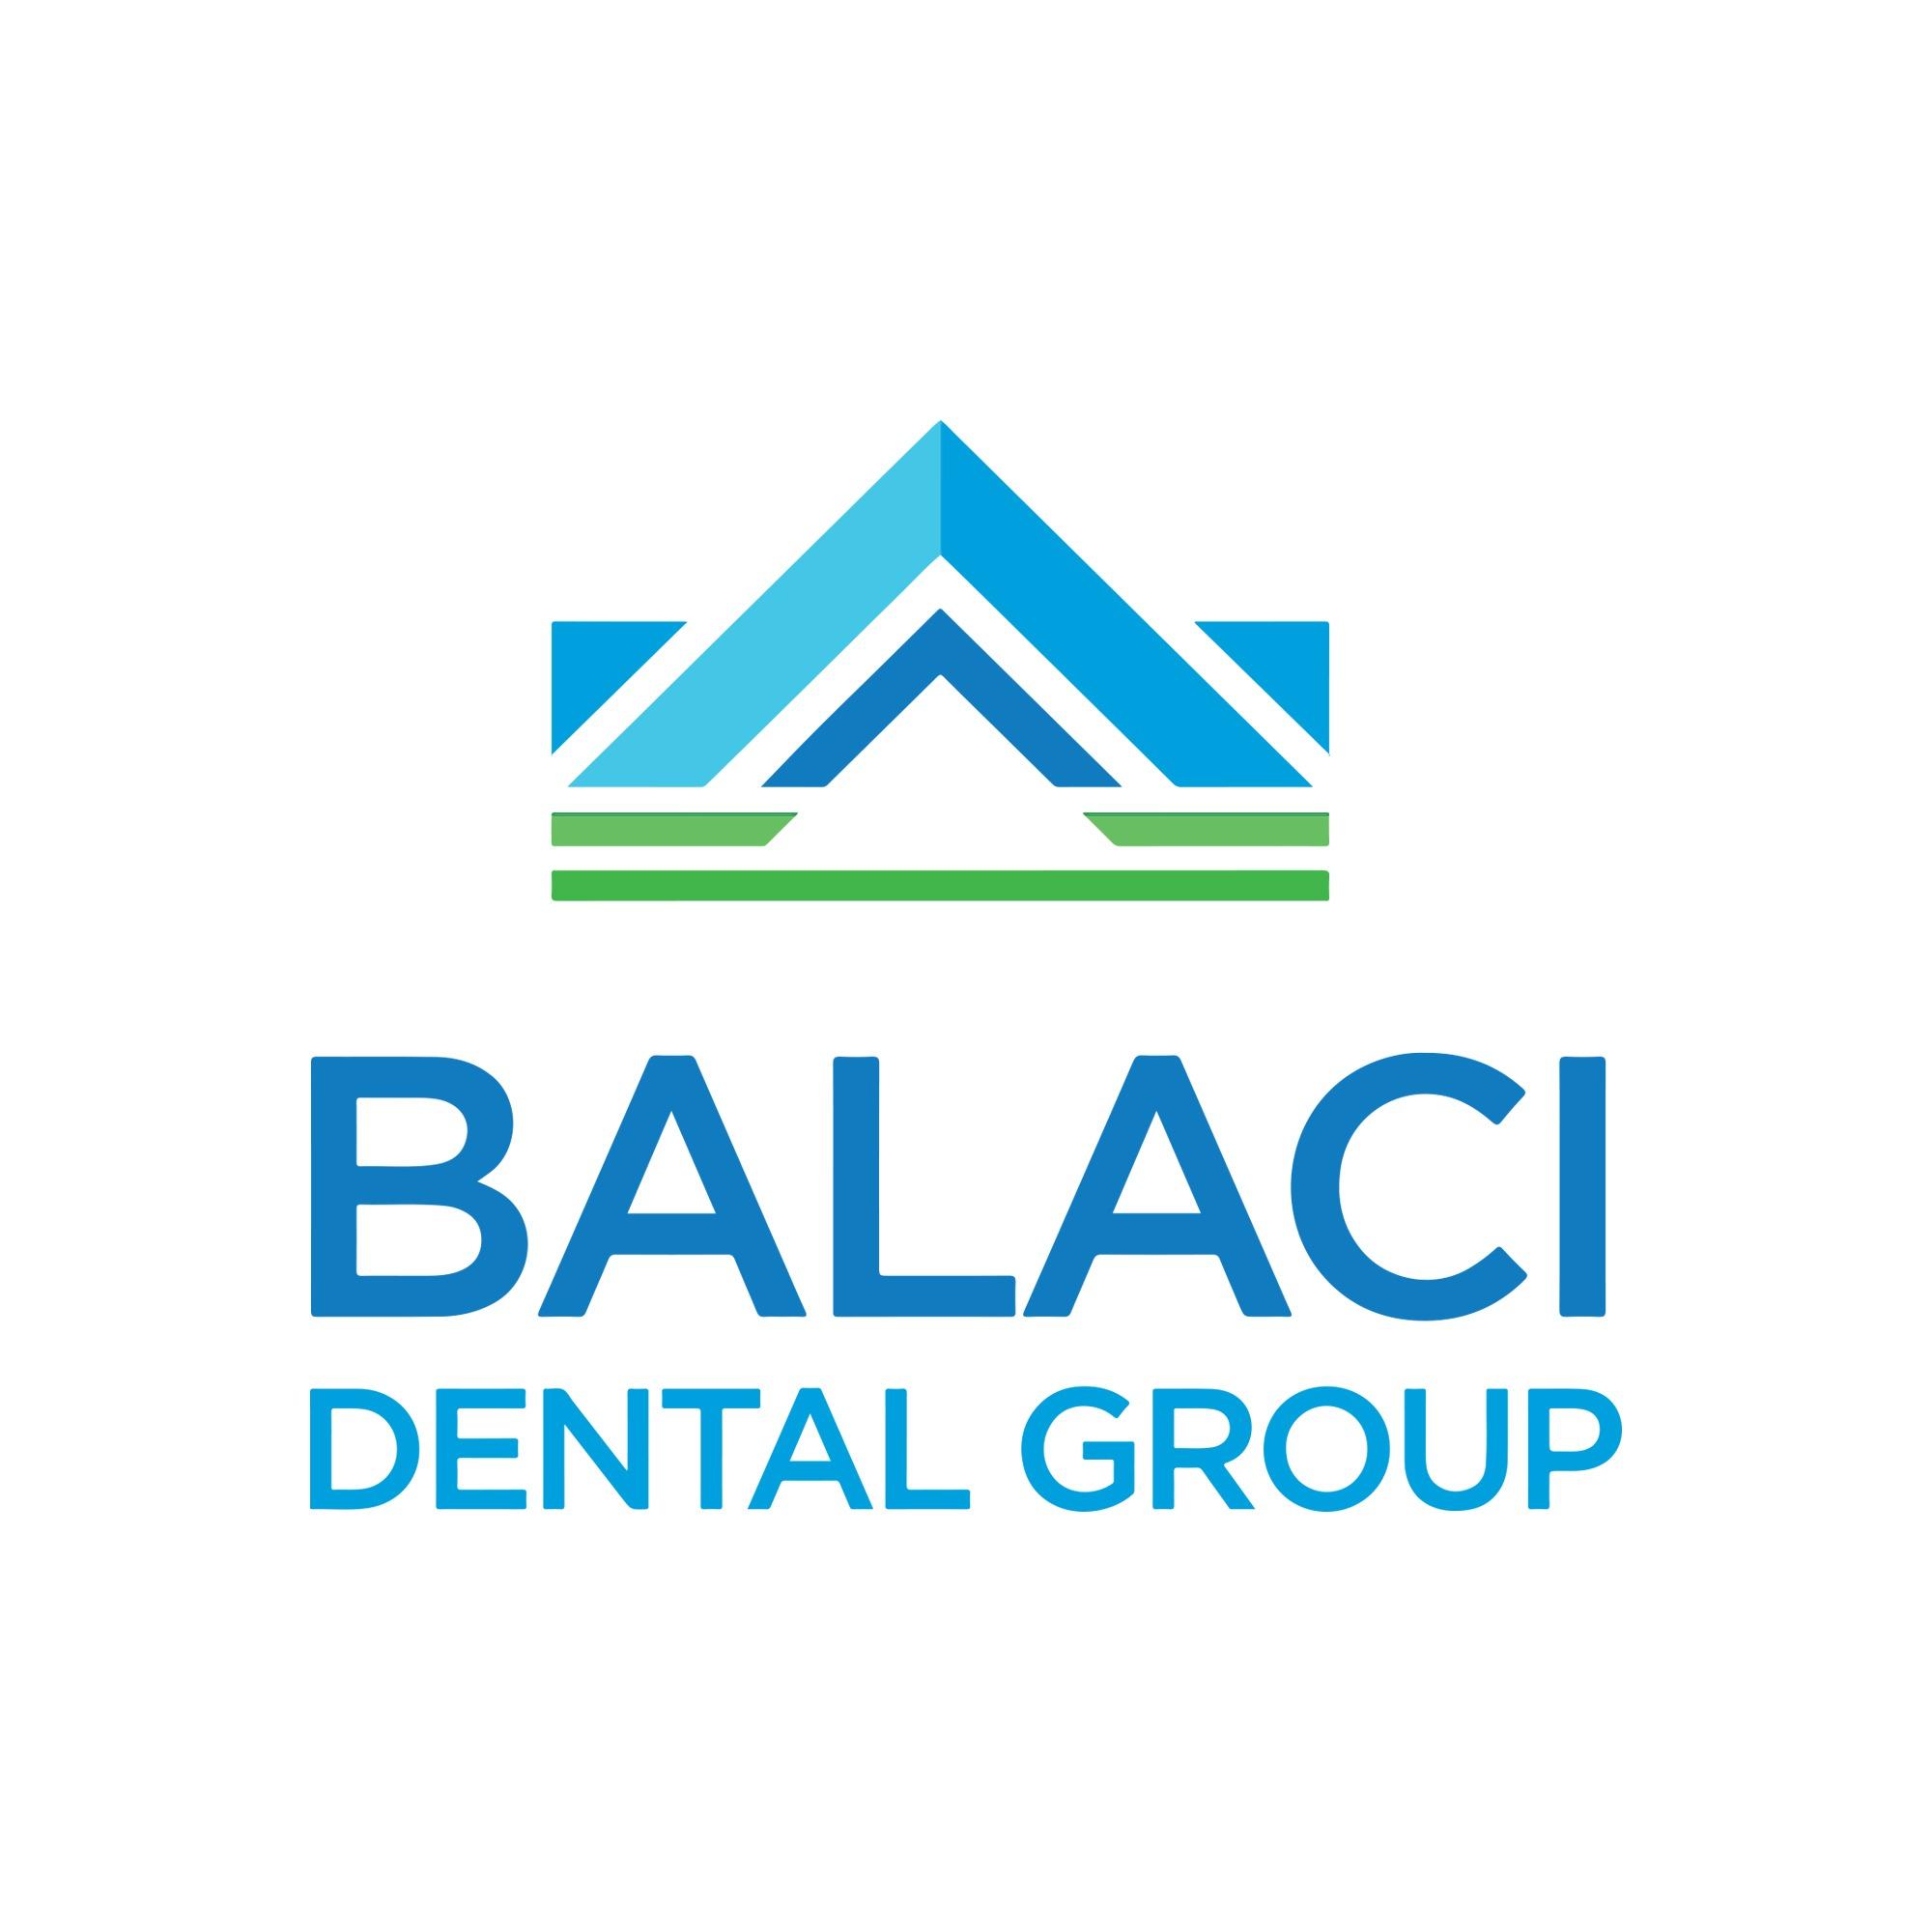 Balaci Dental Group